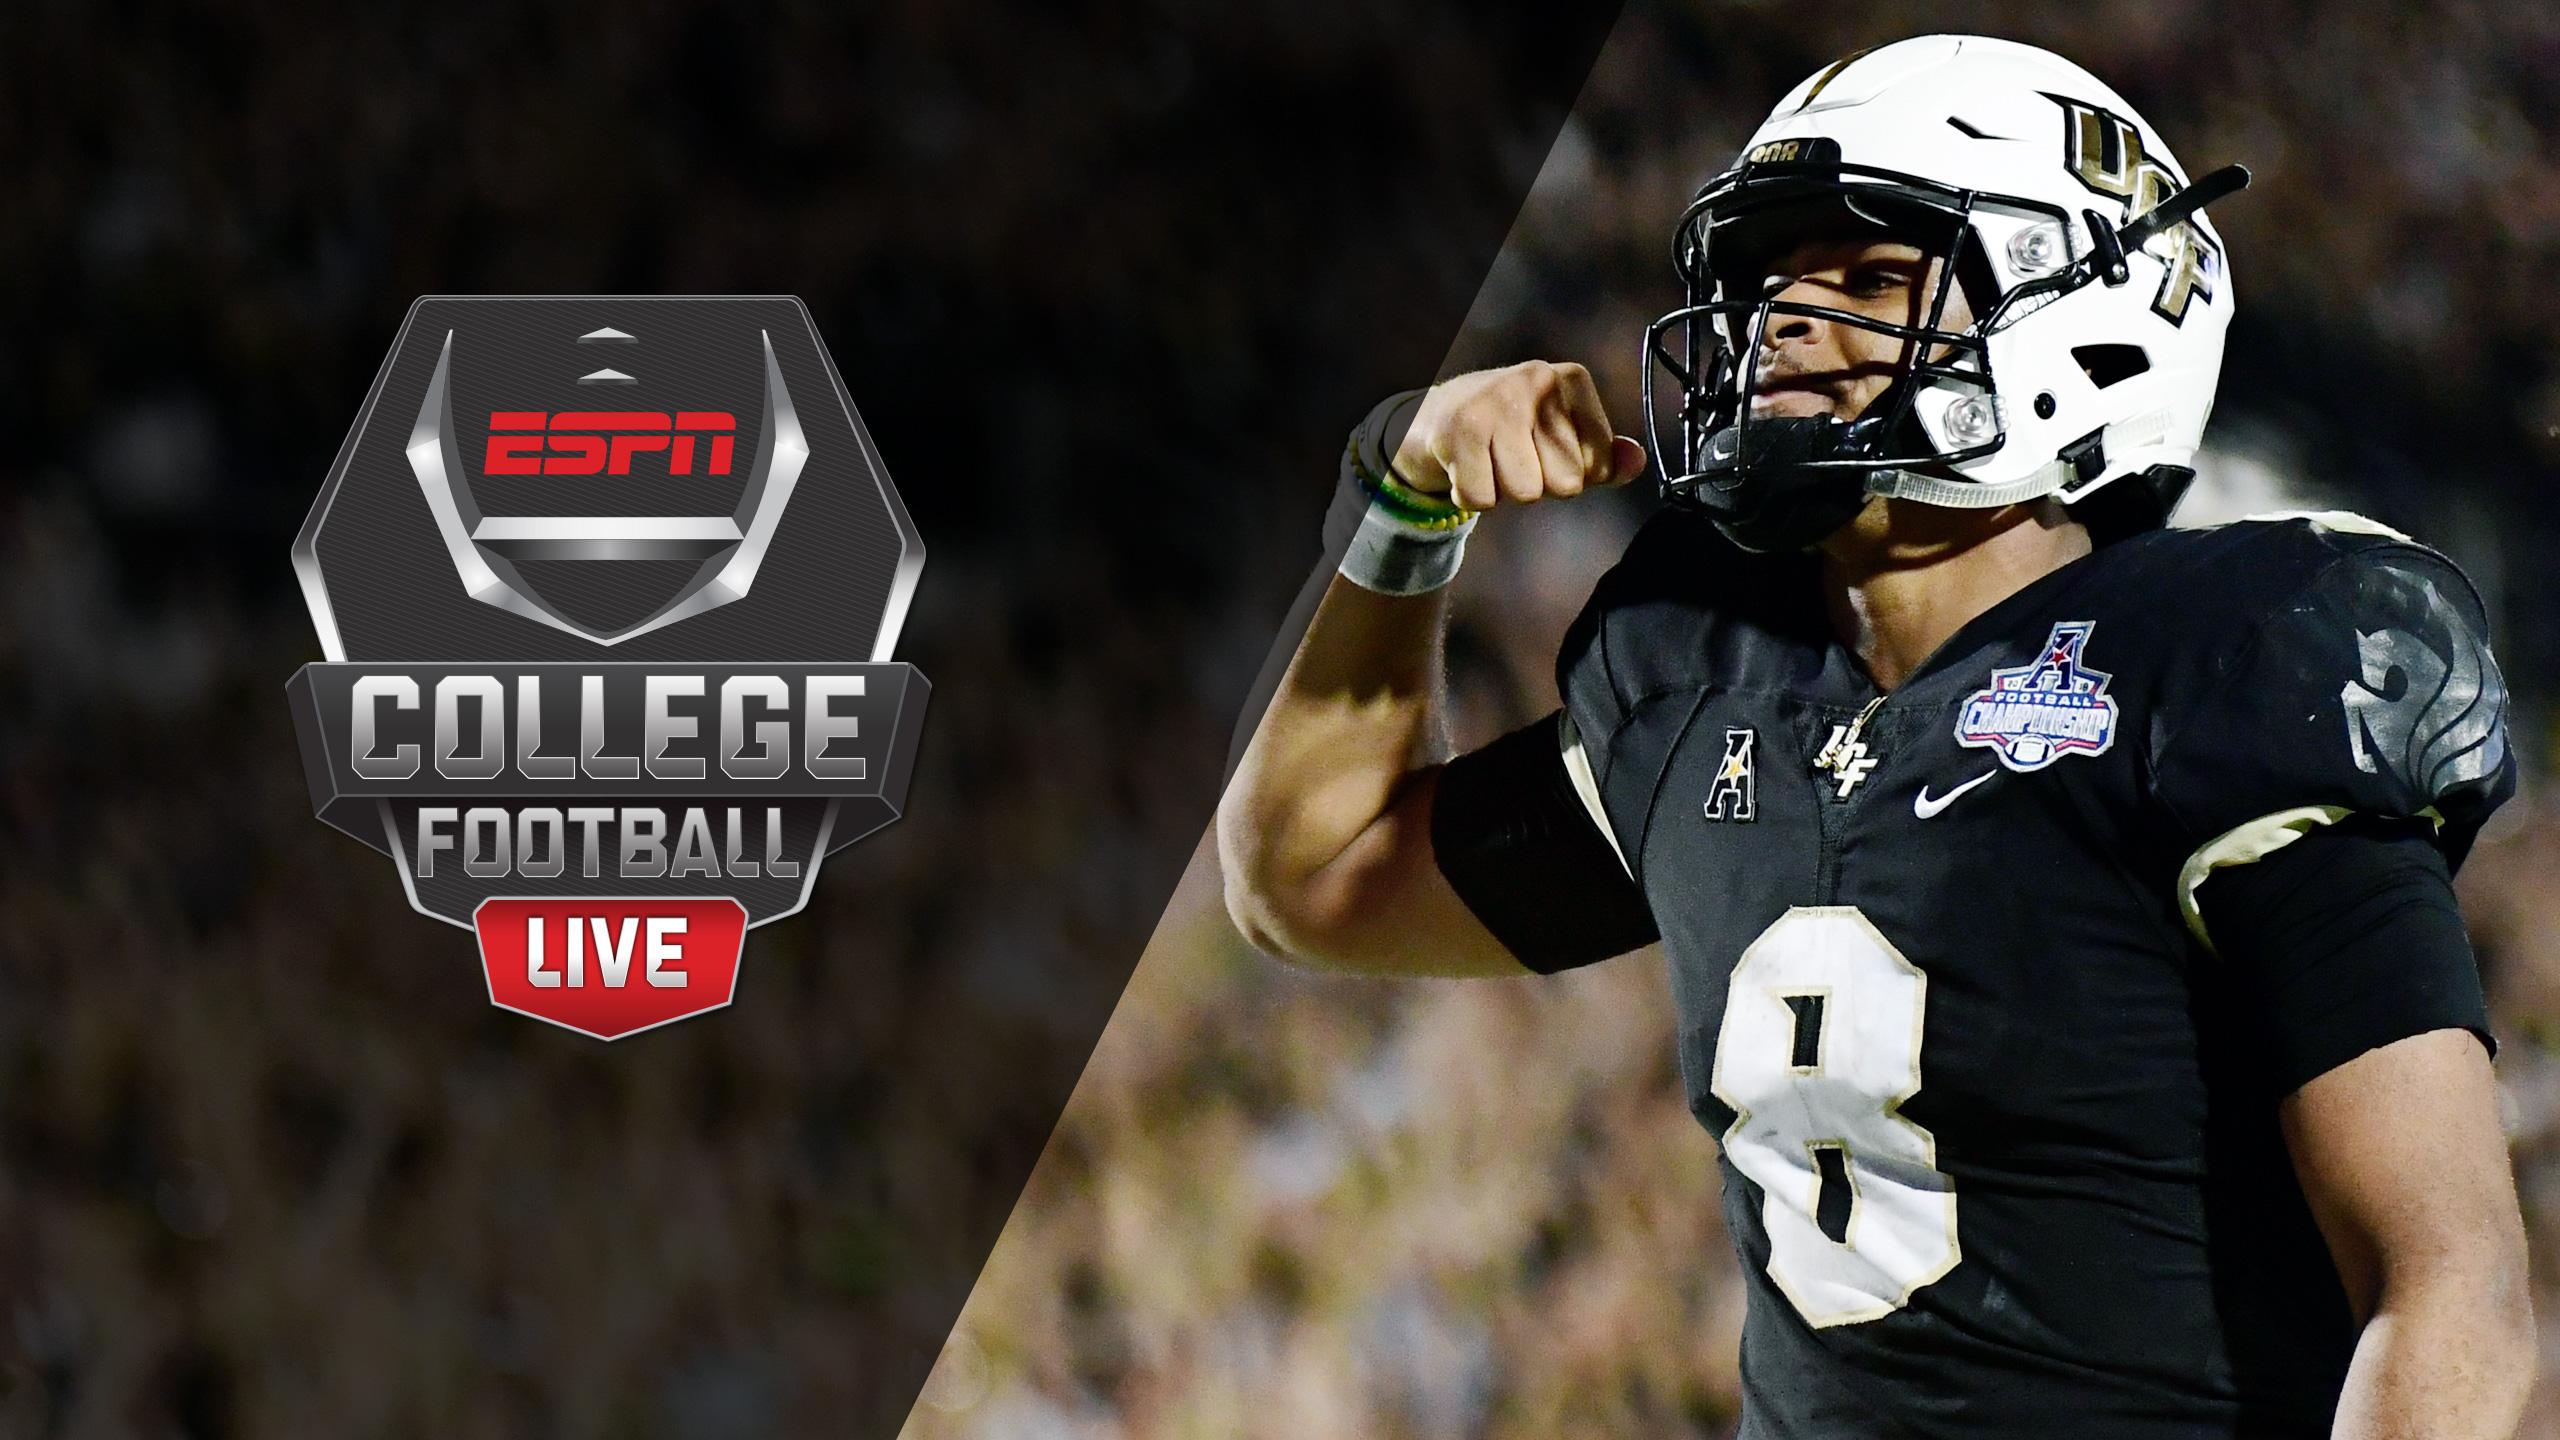 Mon, 12/17 - College Football Live